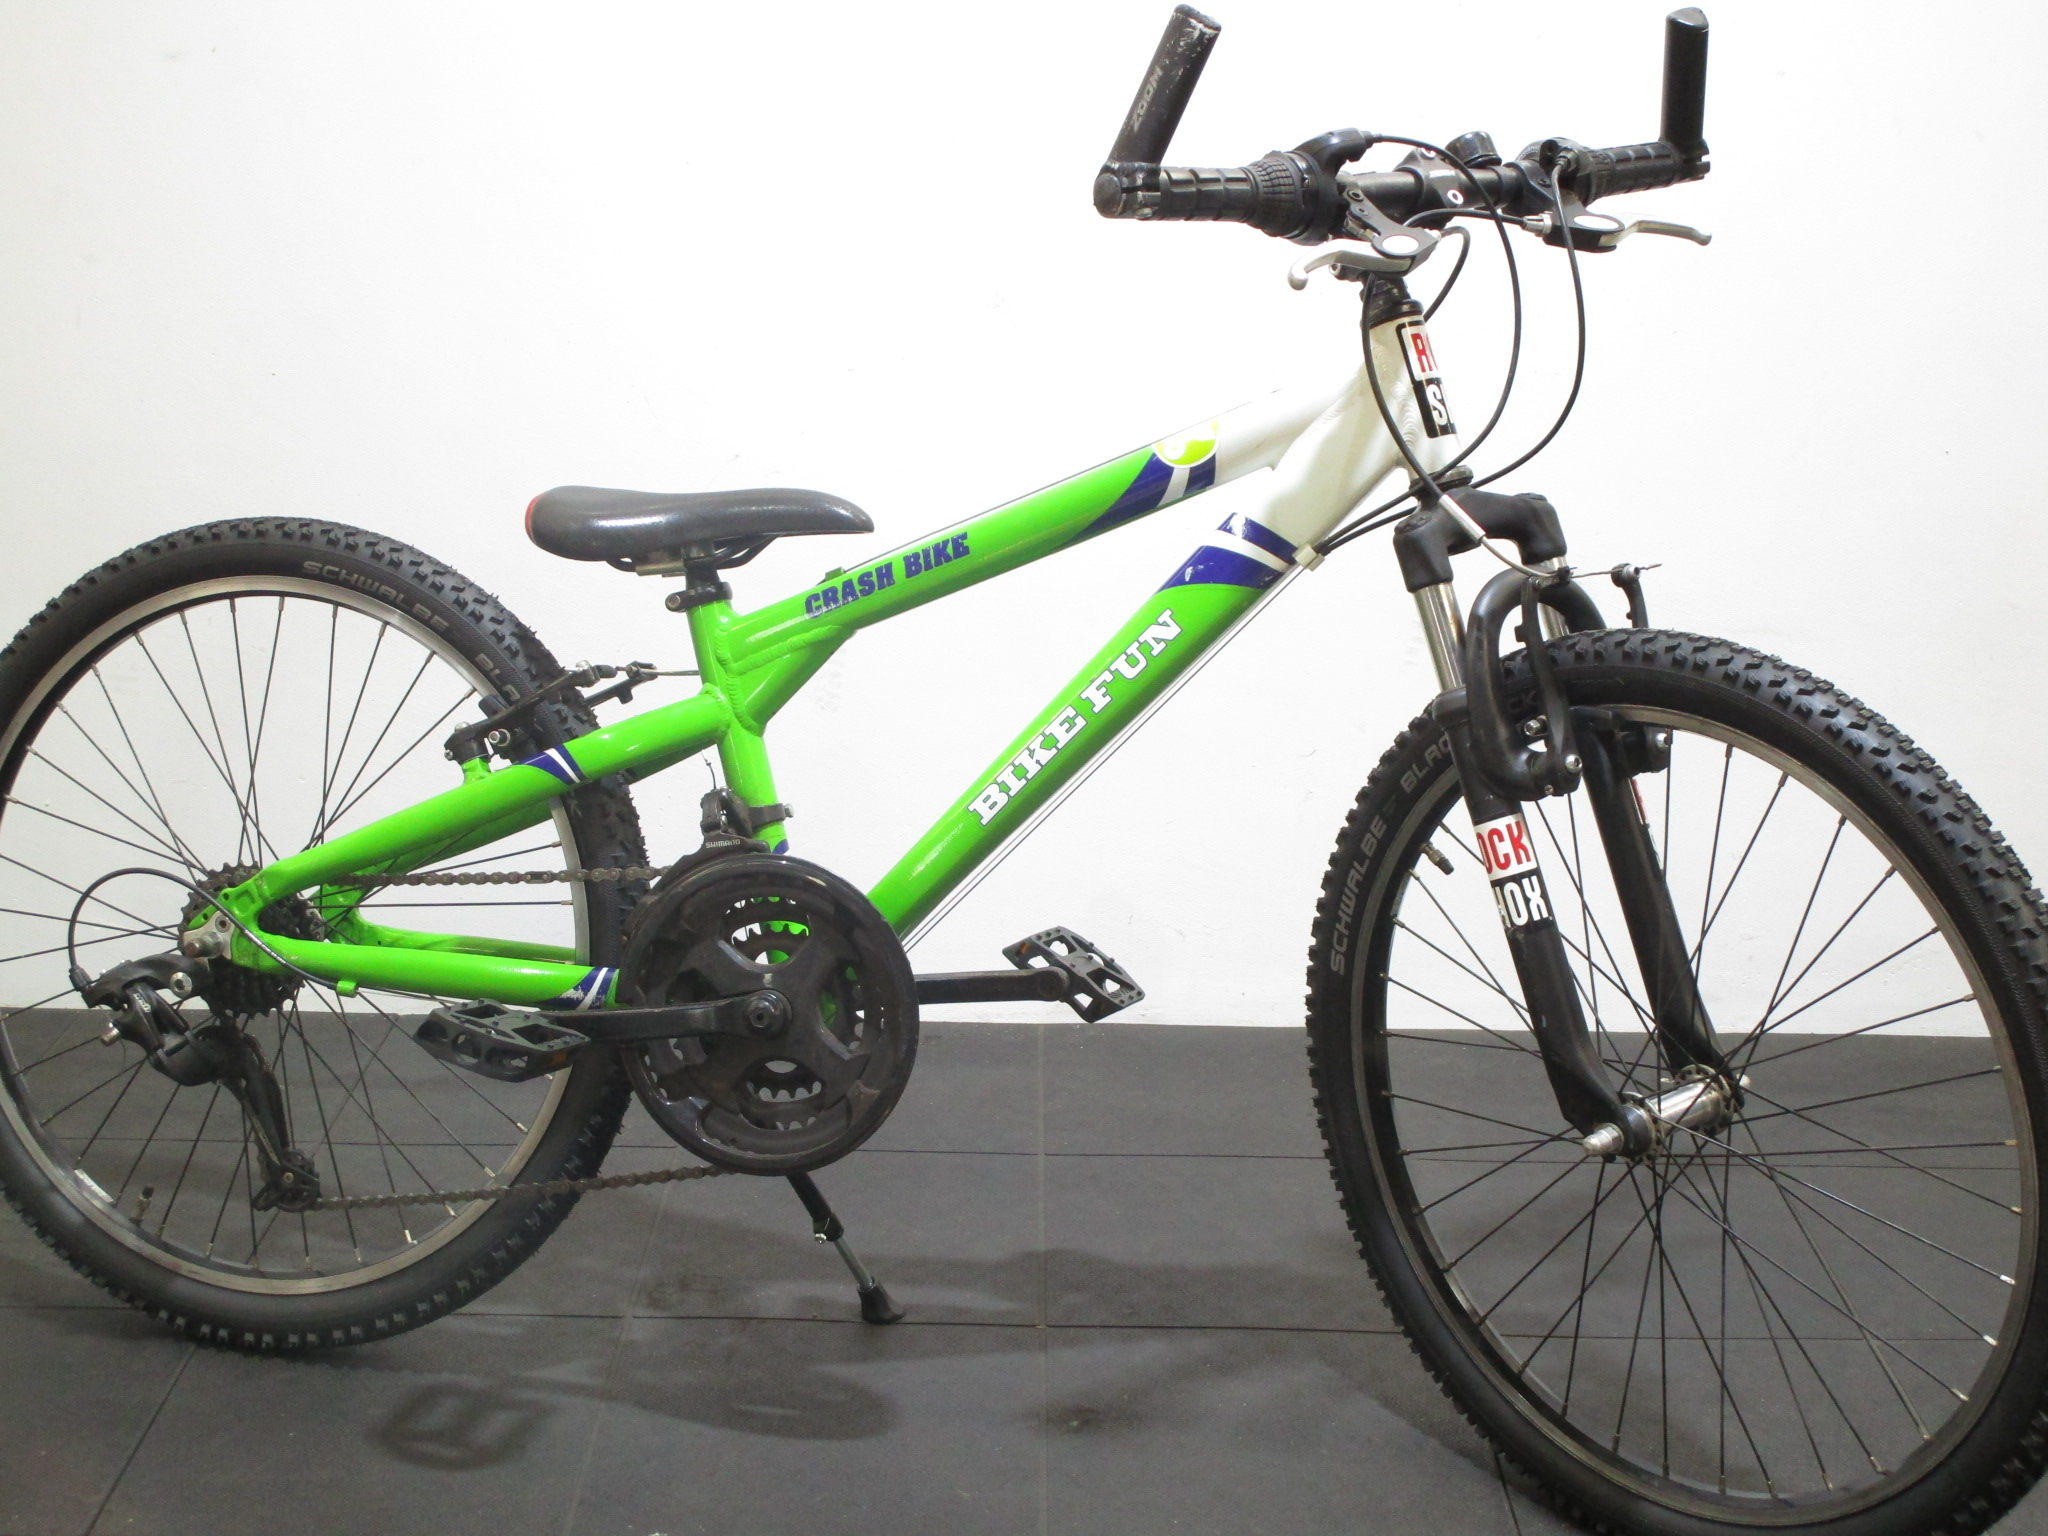 Bike Fun Crashbike 24 inch 21 speed € 179,00